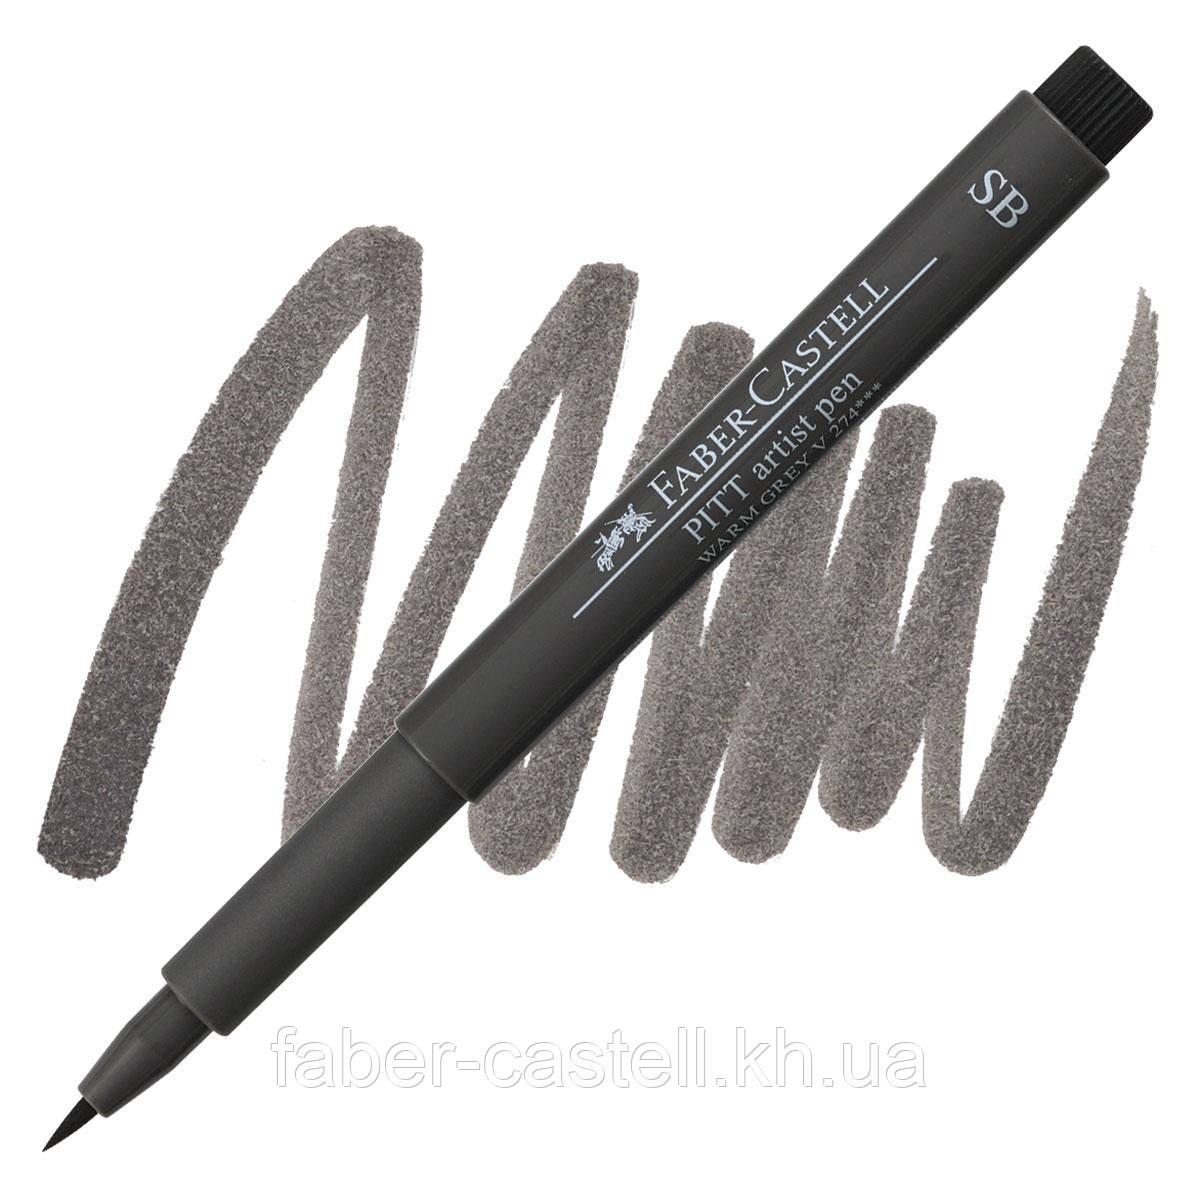 "Ручка-кисточка капиллярная Faber - Castell PITT® ARTIST PEN ""SOFT BRUSH"" № 274 теплый серый V, 167874"